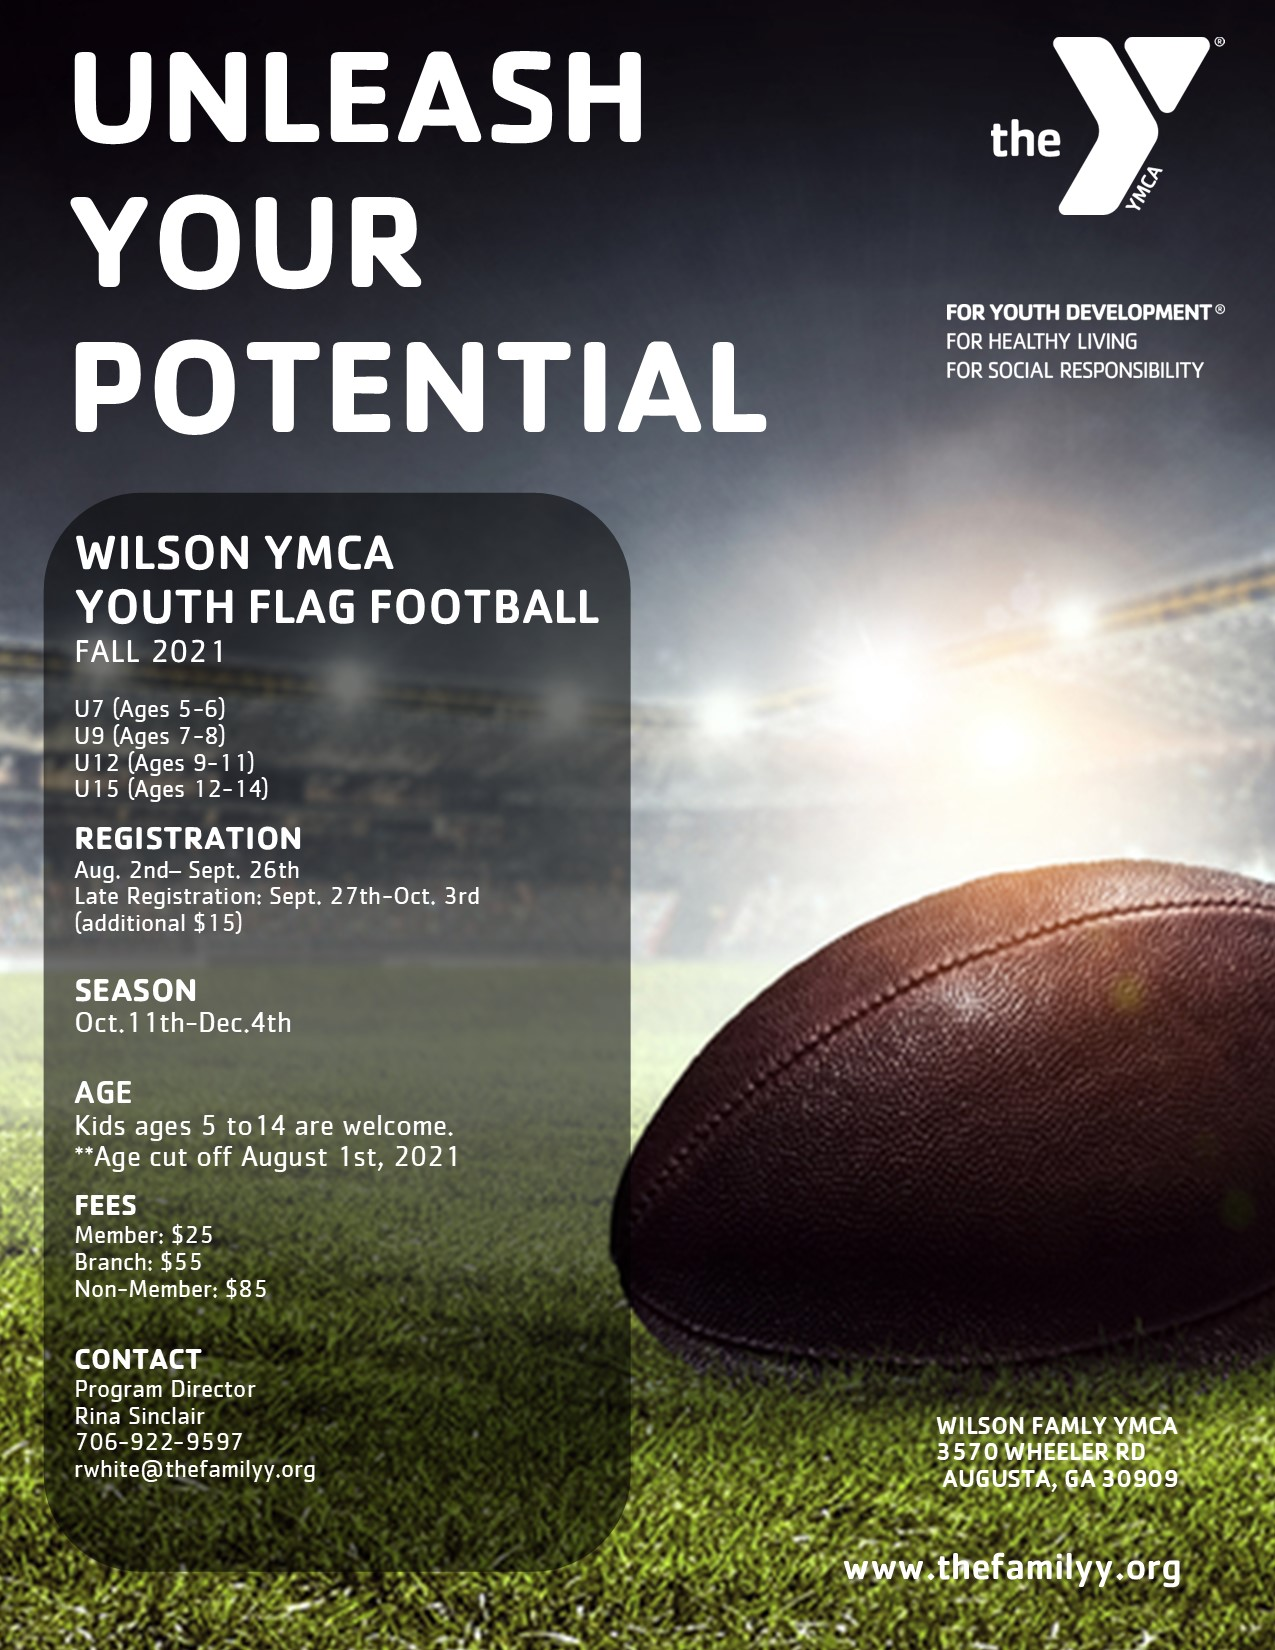 Flag Football Registration is open